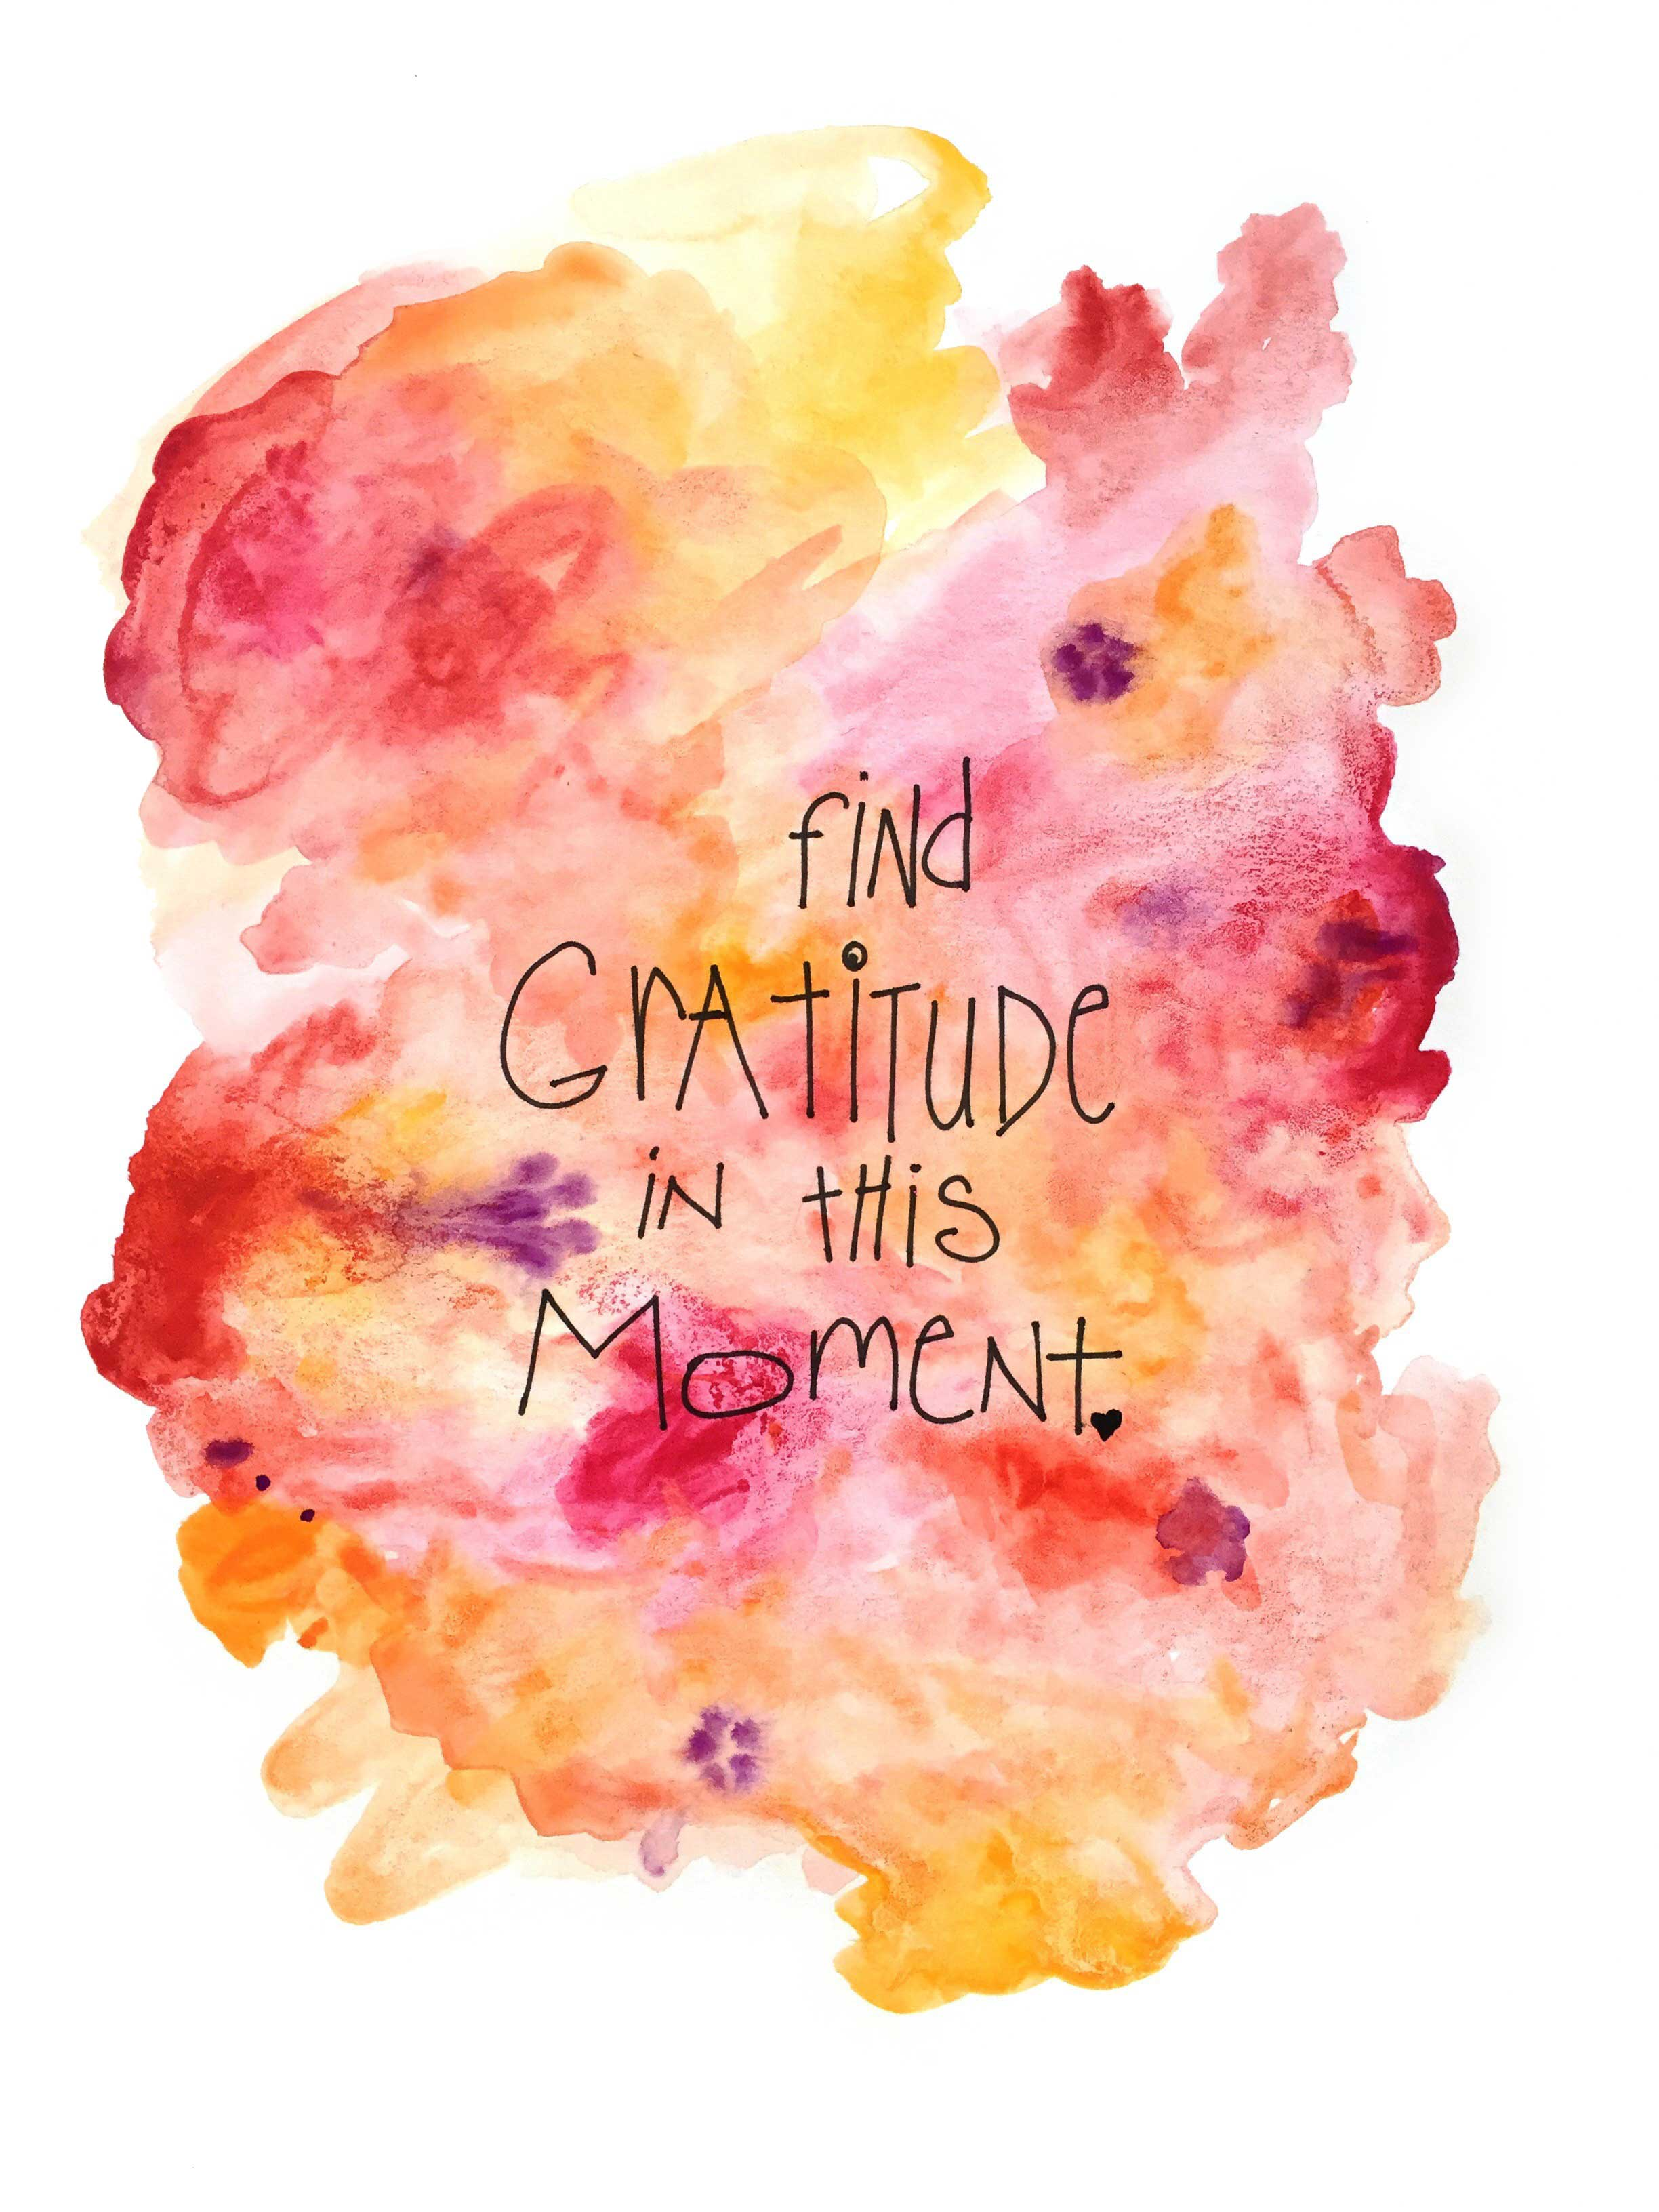 gratitudemomentweb.jpg